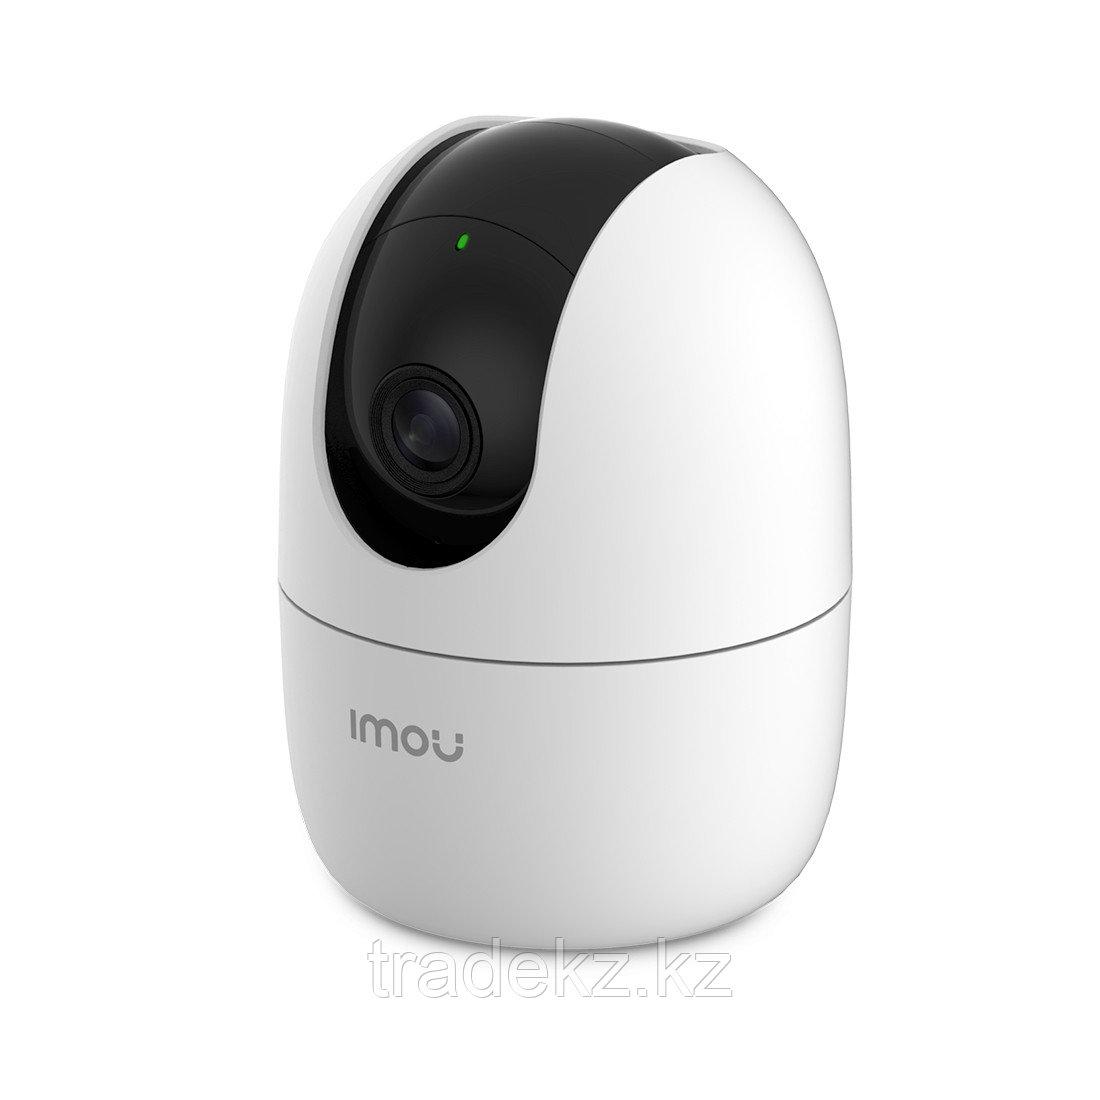 Интернет-камера, поворотная Wi-Fi видеокамера Imou Ranger 2